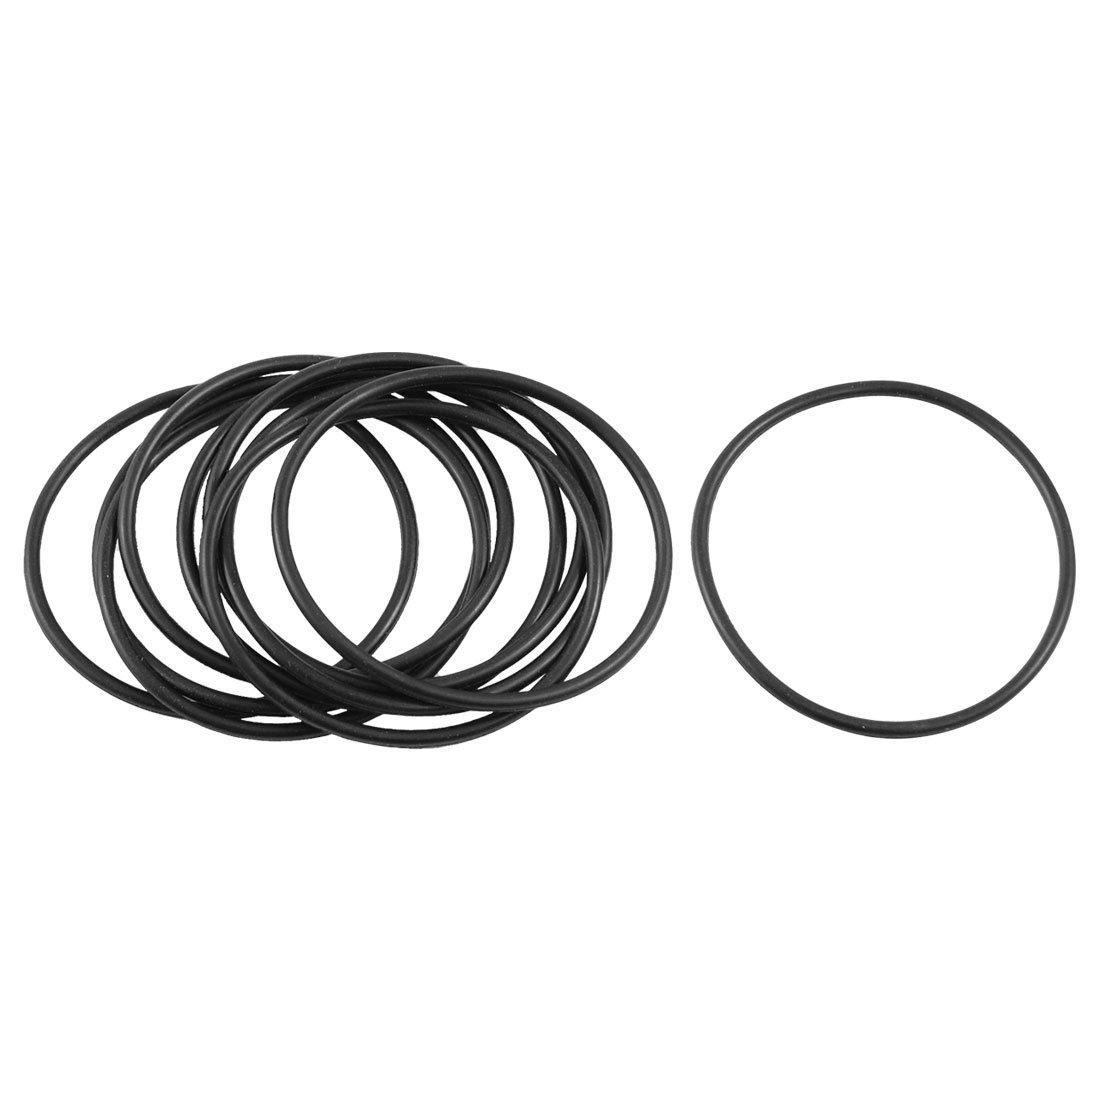 10 Pcs 40mm x 44mm x 2mm Nitrile Rubber Sealing O Ring Gasket Washer